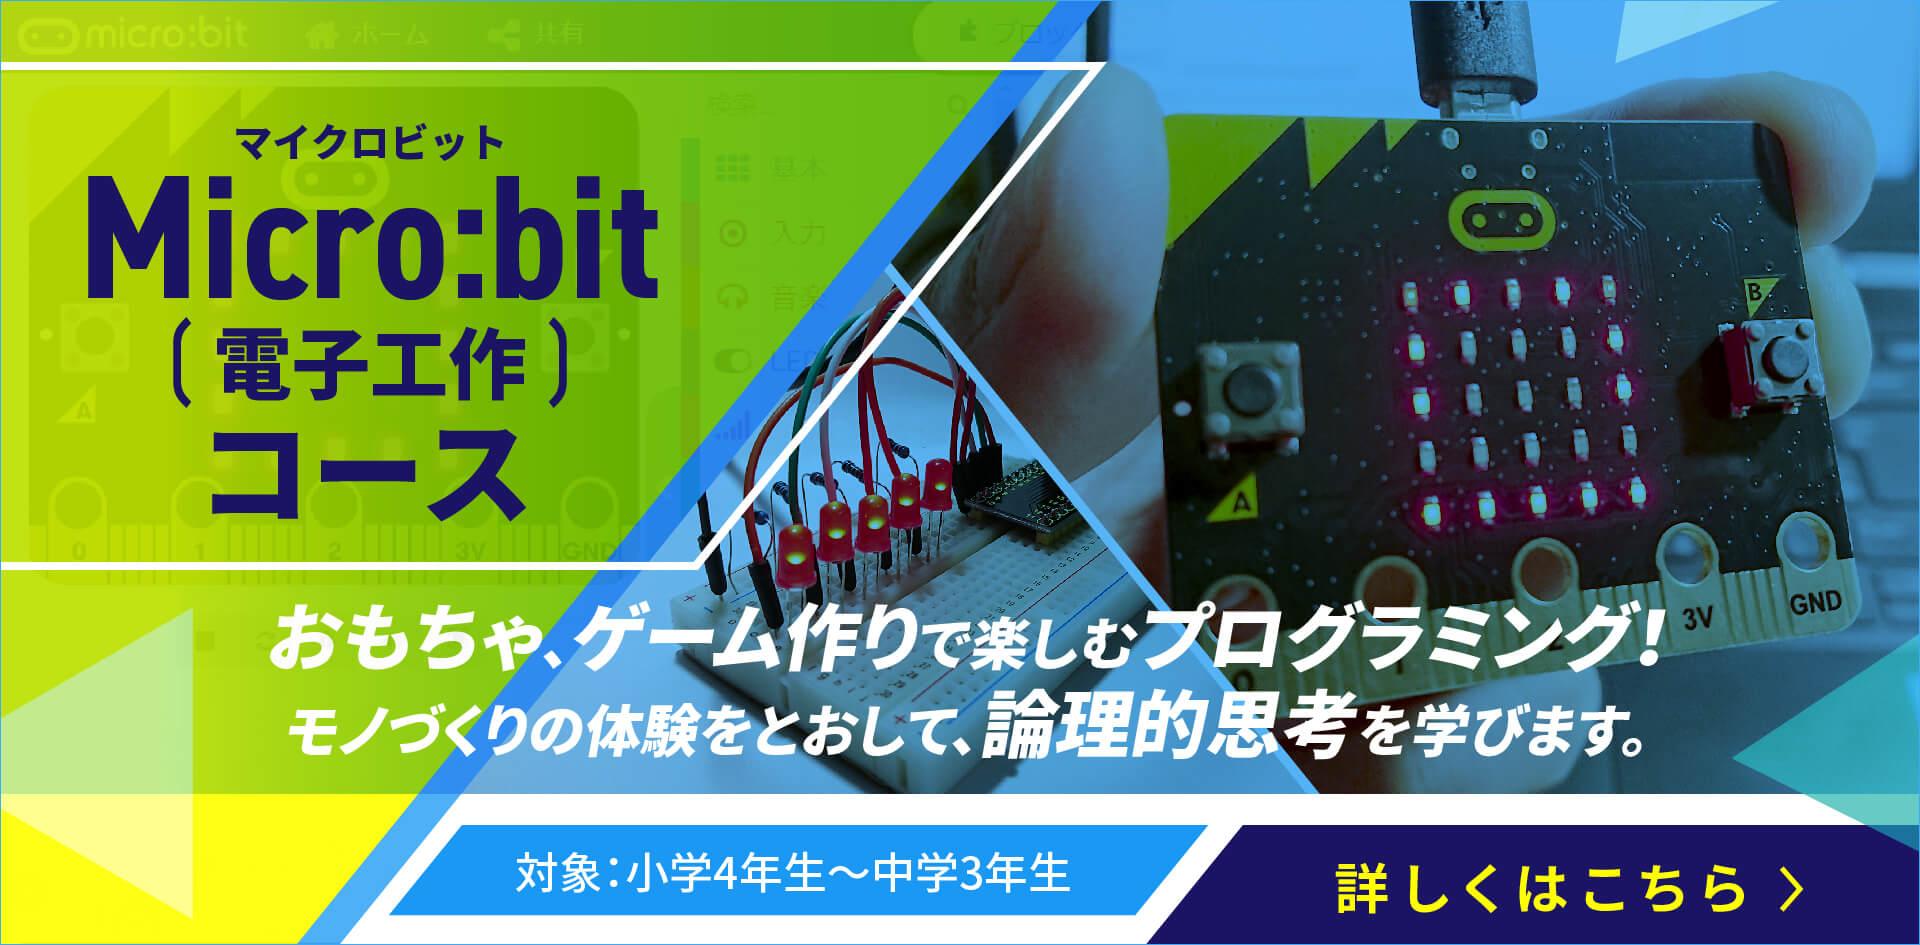 Micro:bit(電子工作)コース